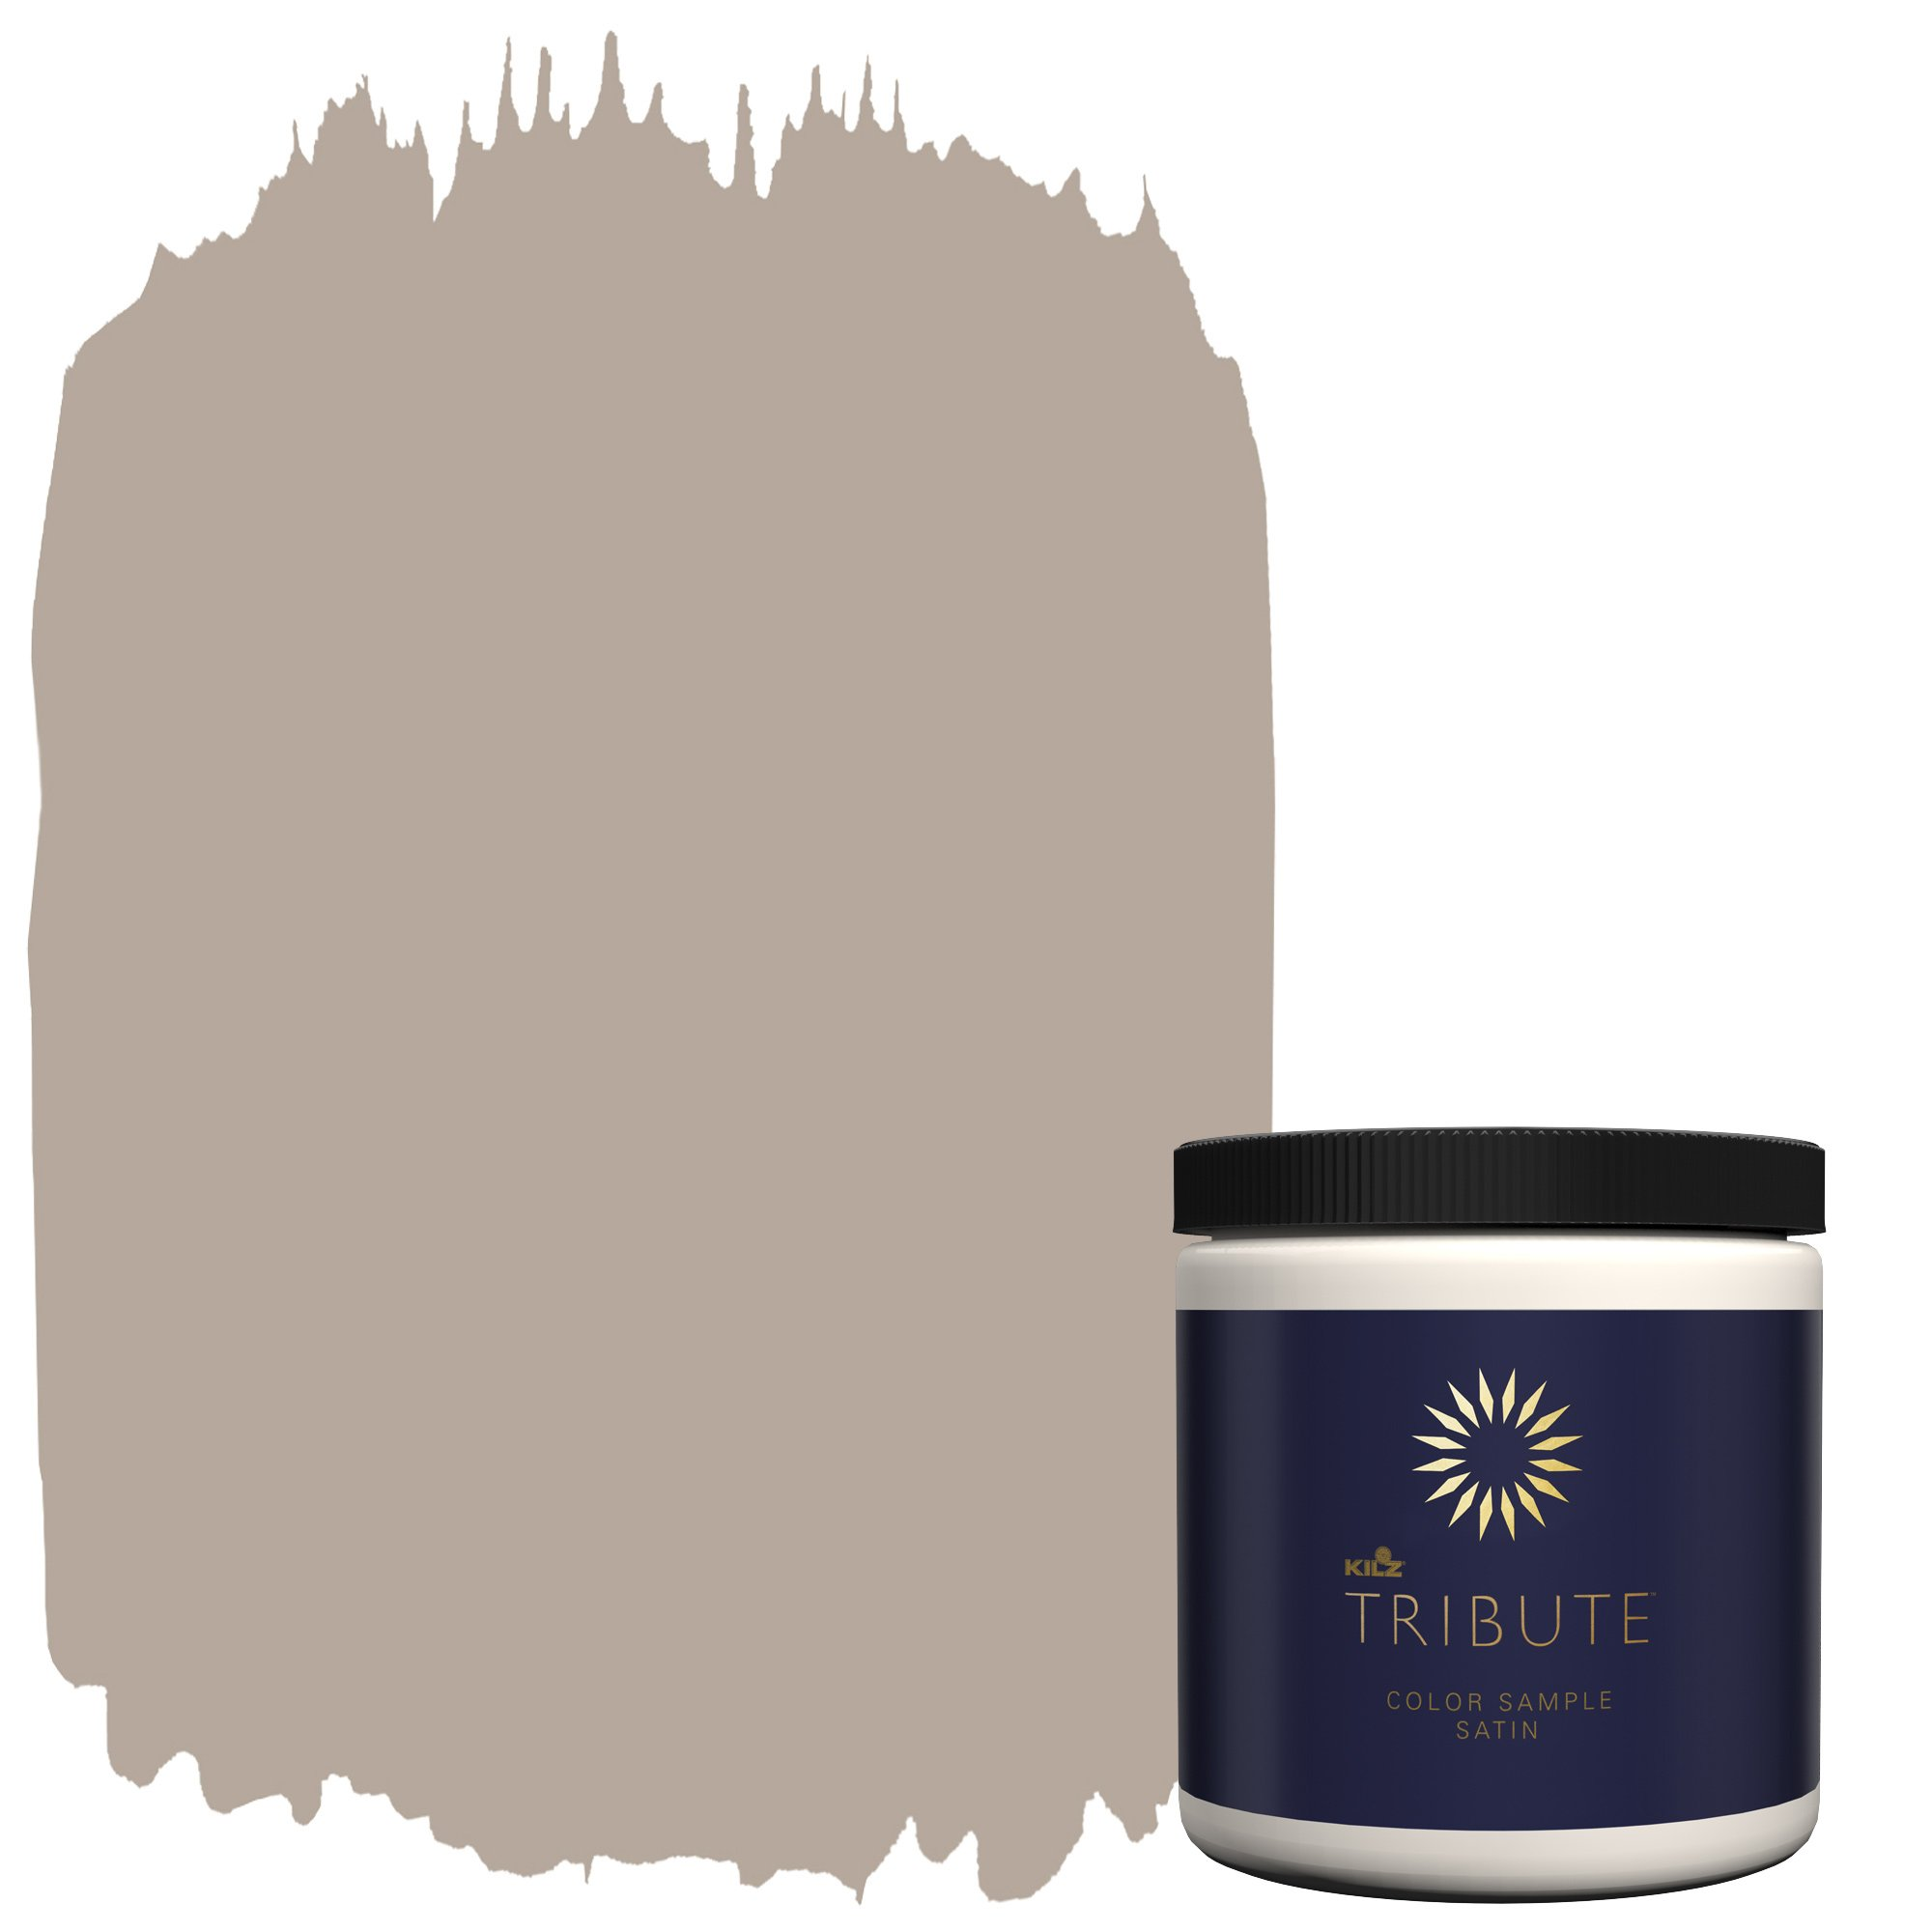 KILZ Tribute Interior Satin Paint & Primer in One, 8-Ounce Sample, Fawn Doe (TB-24)